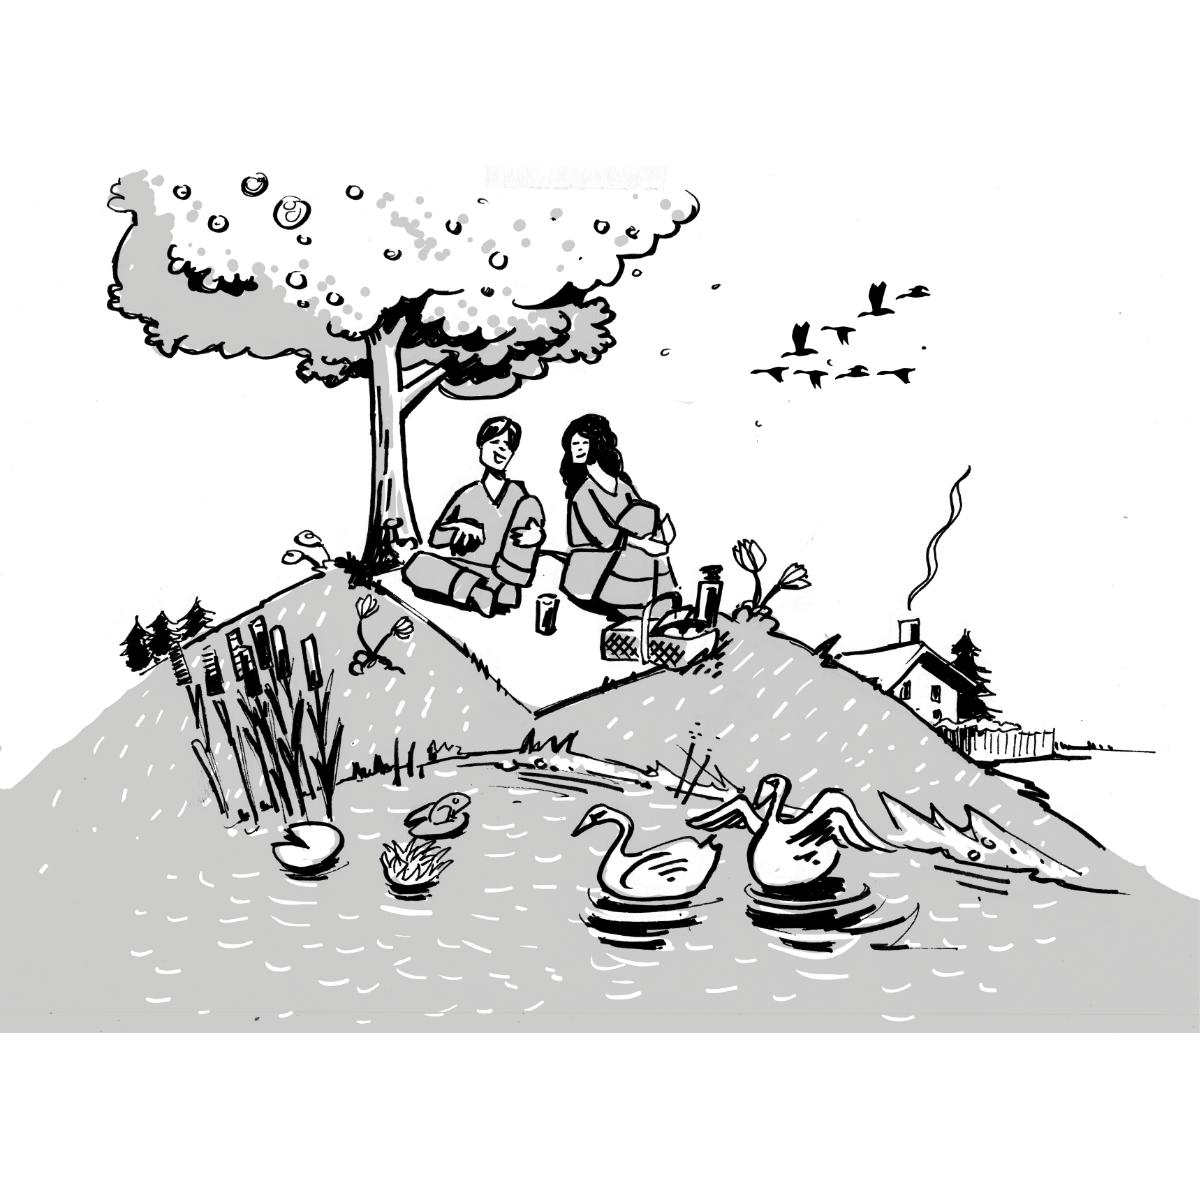 33-vignette-education-school-spring.jpg